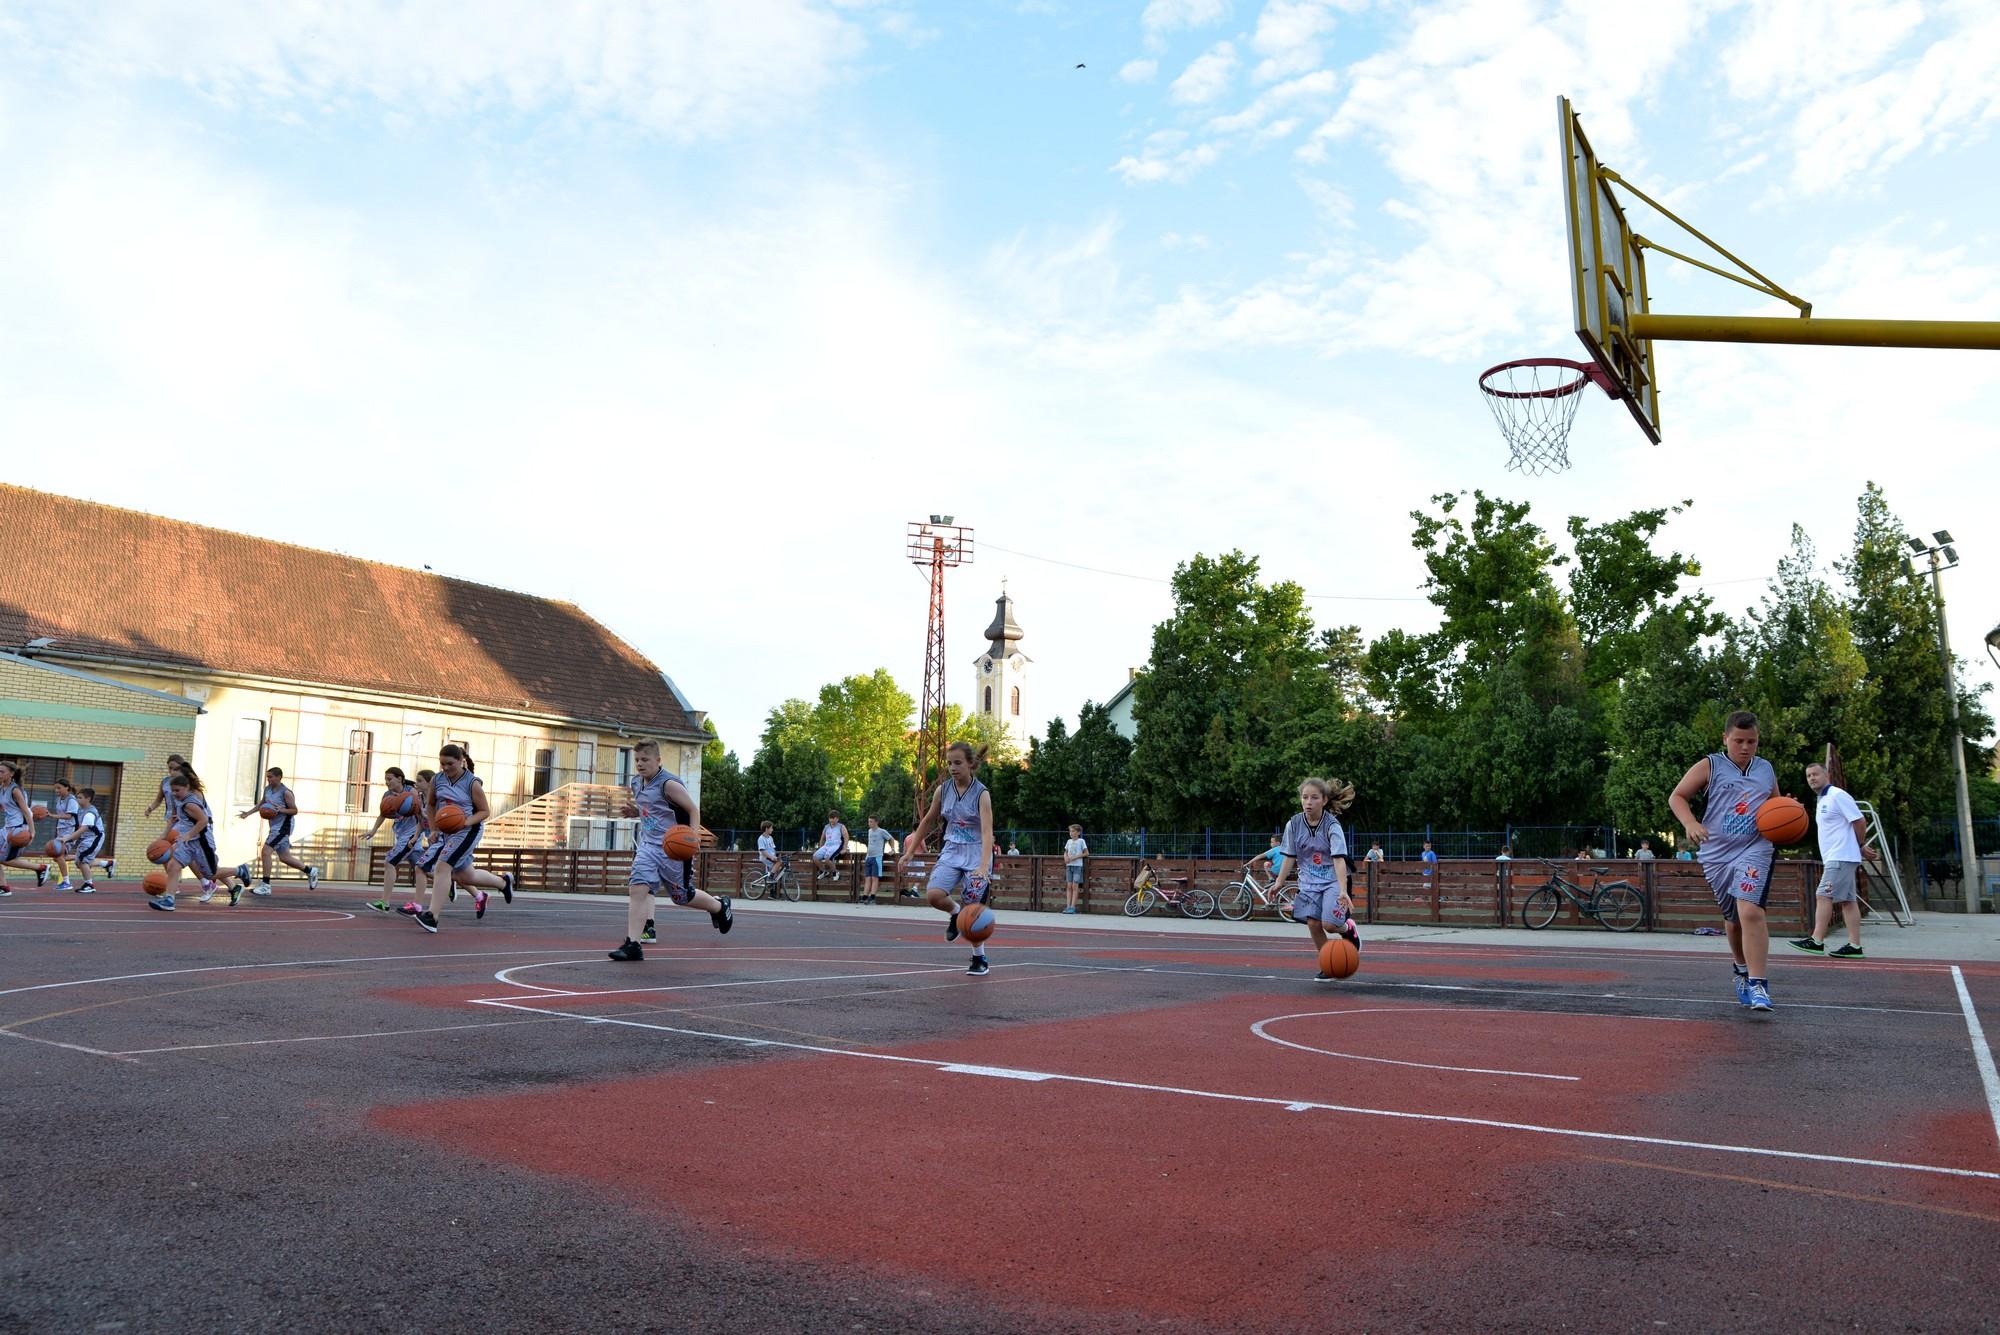 Basketfriends 2017. - second outdoor court